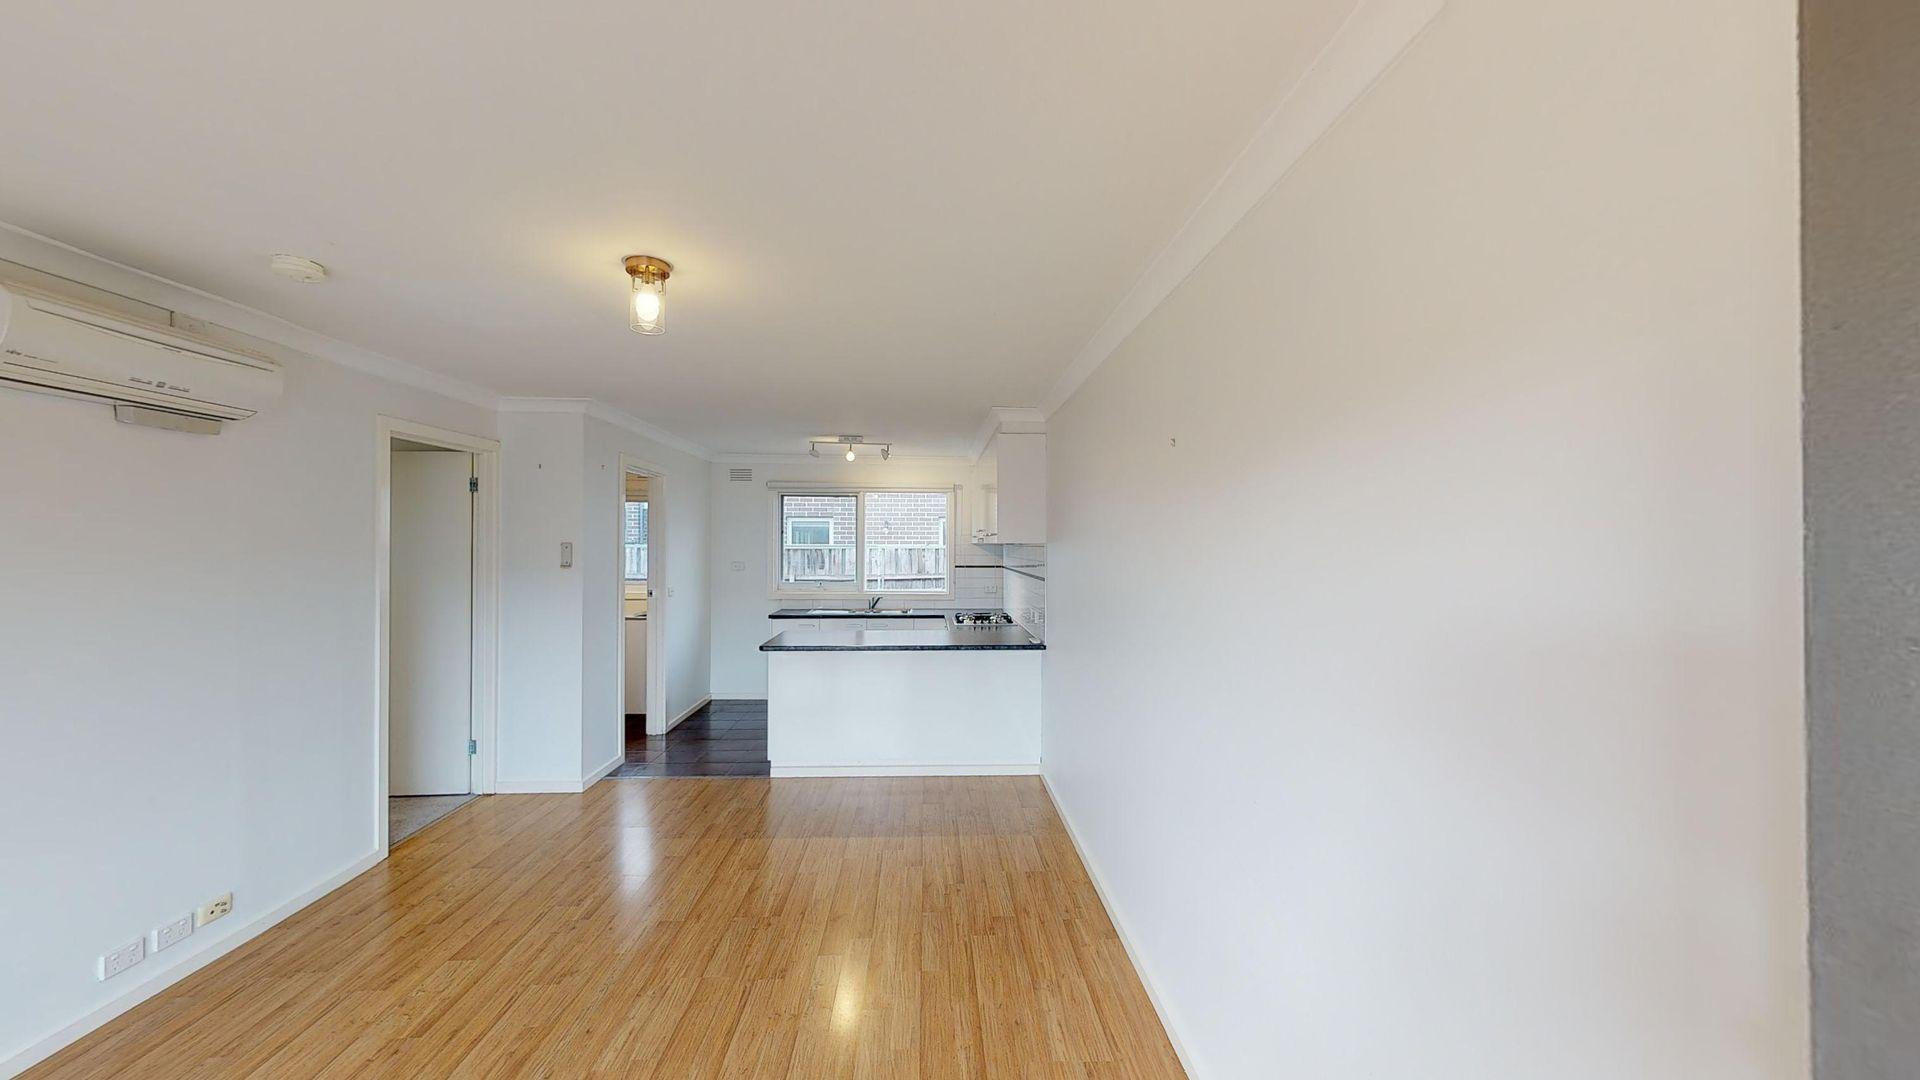 4/48 Mundy Street, Geelong VIC 3220, Image 2